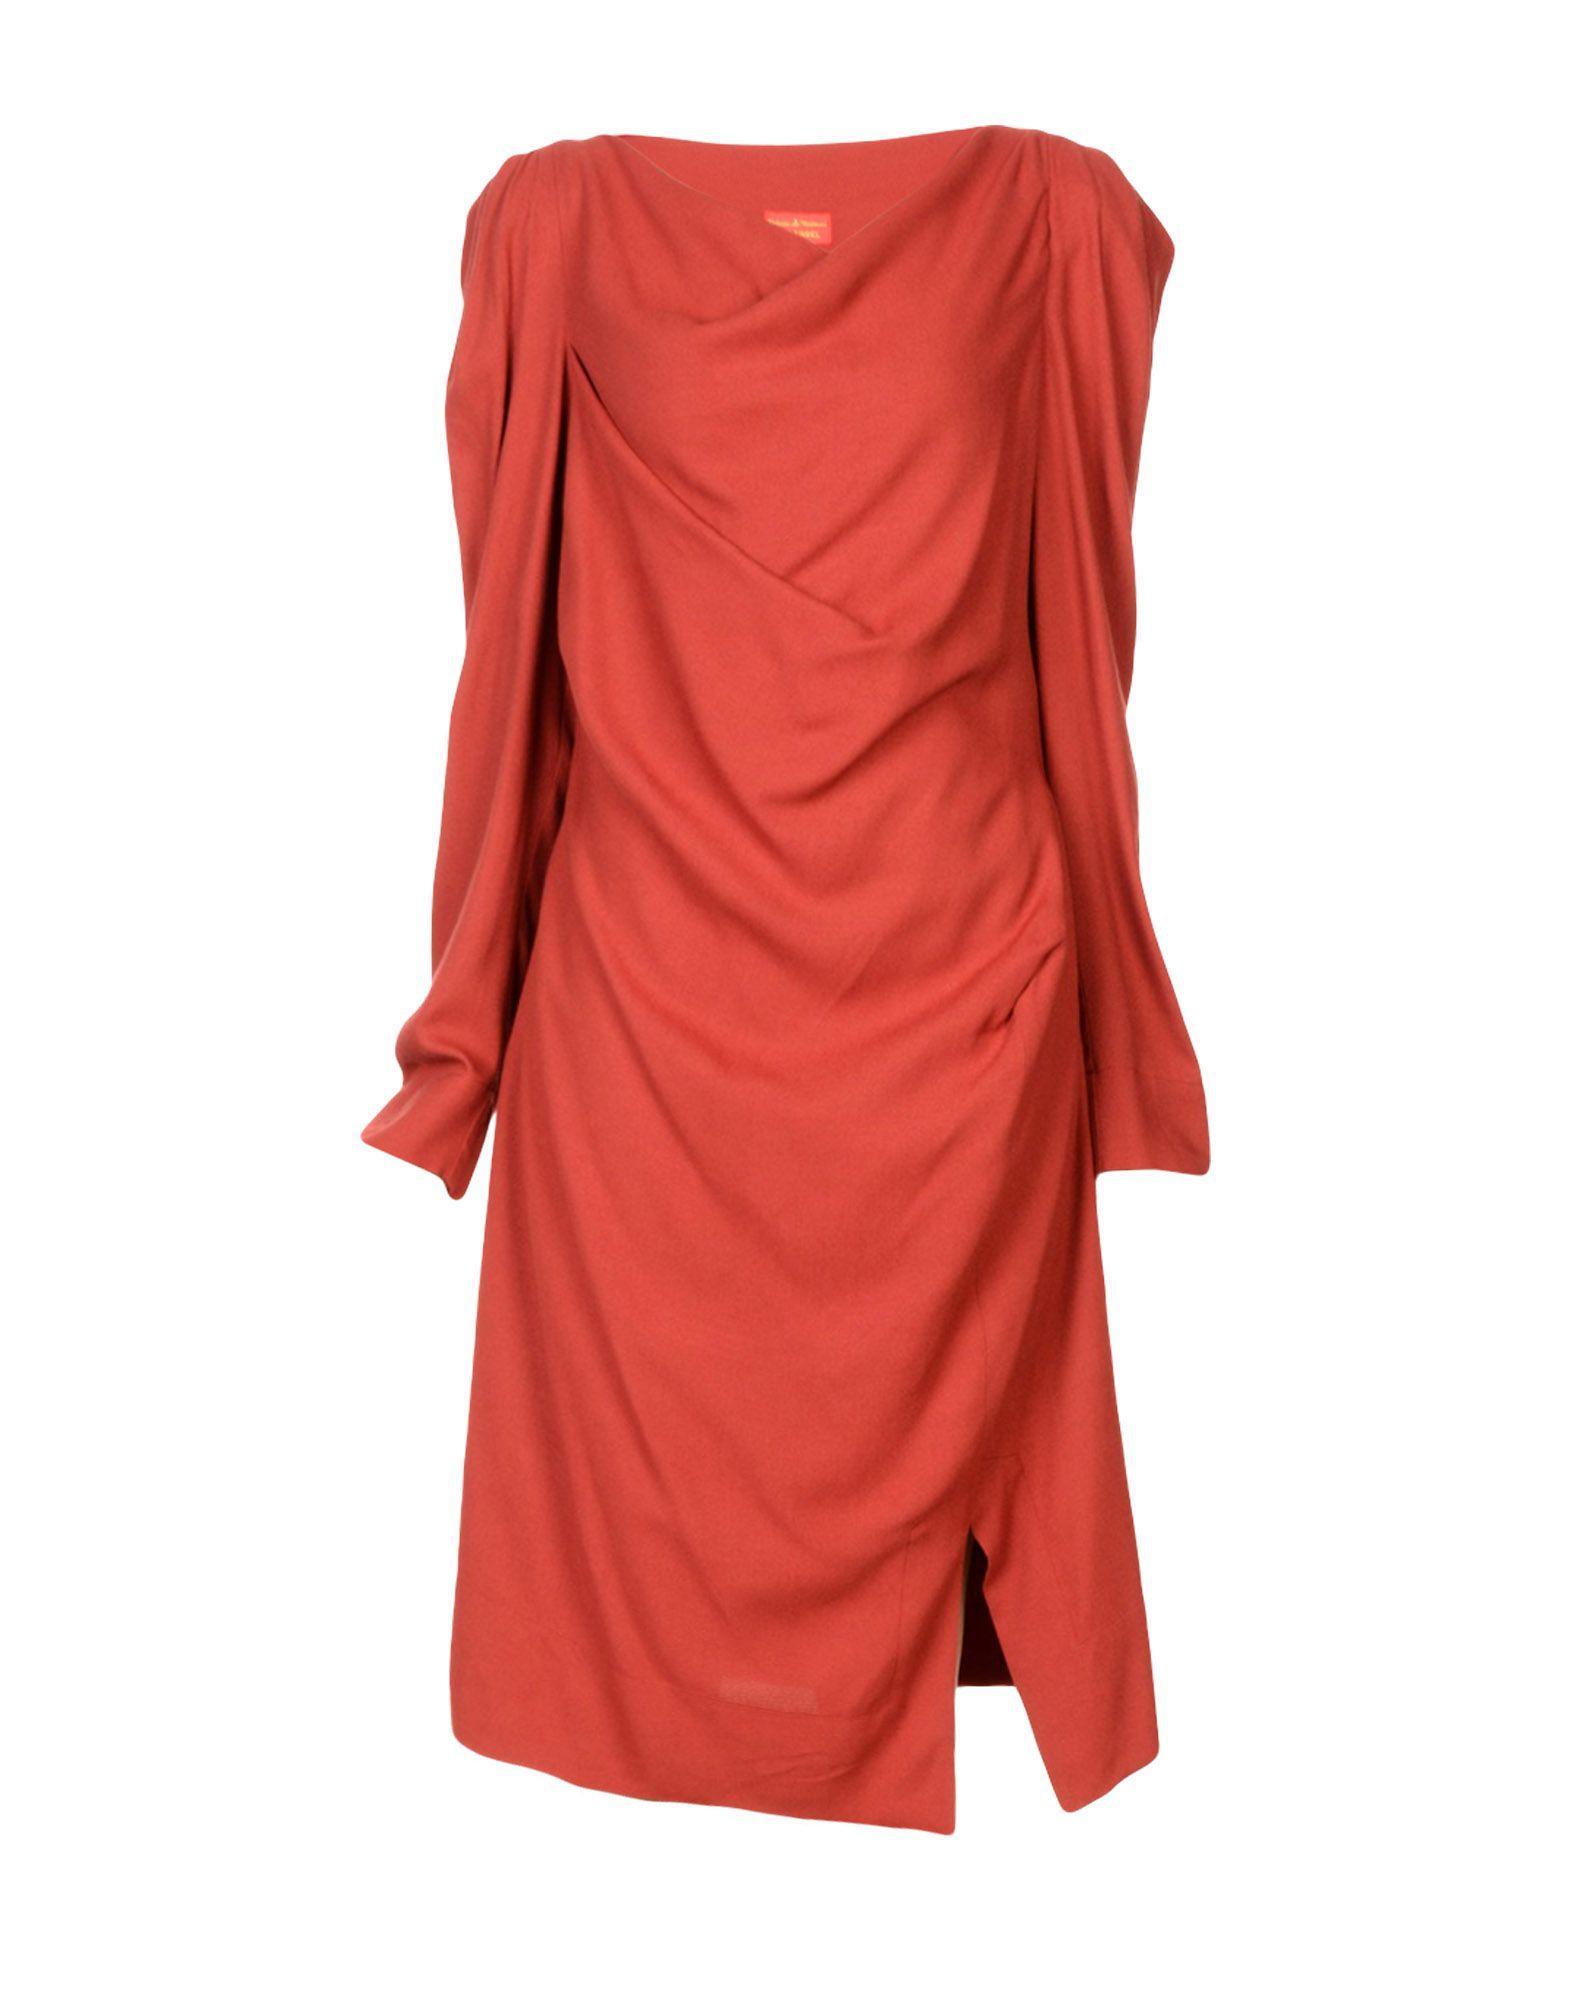 Vivienne Westwood Red Label Knee-length Dresses In Brick Red